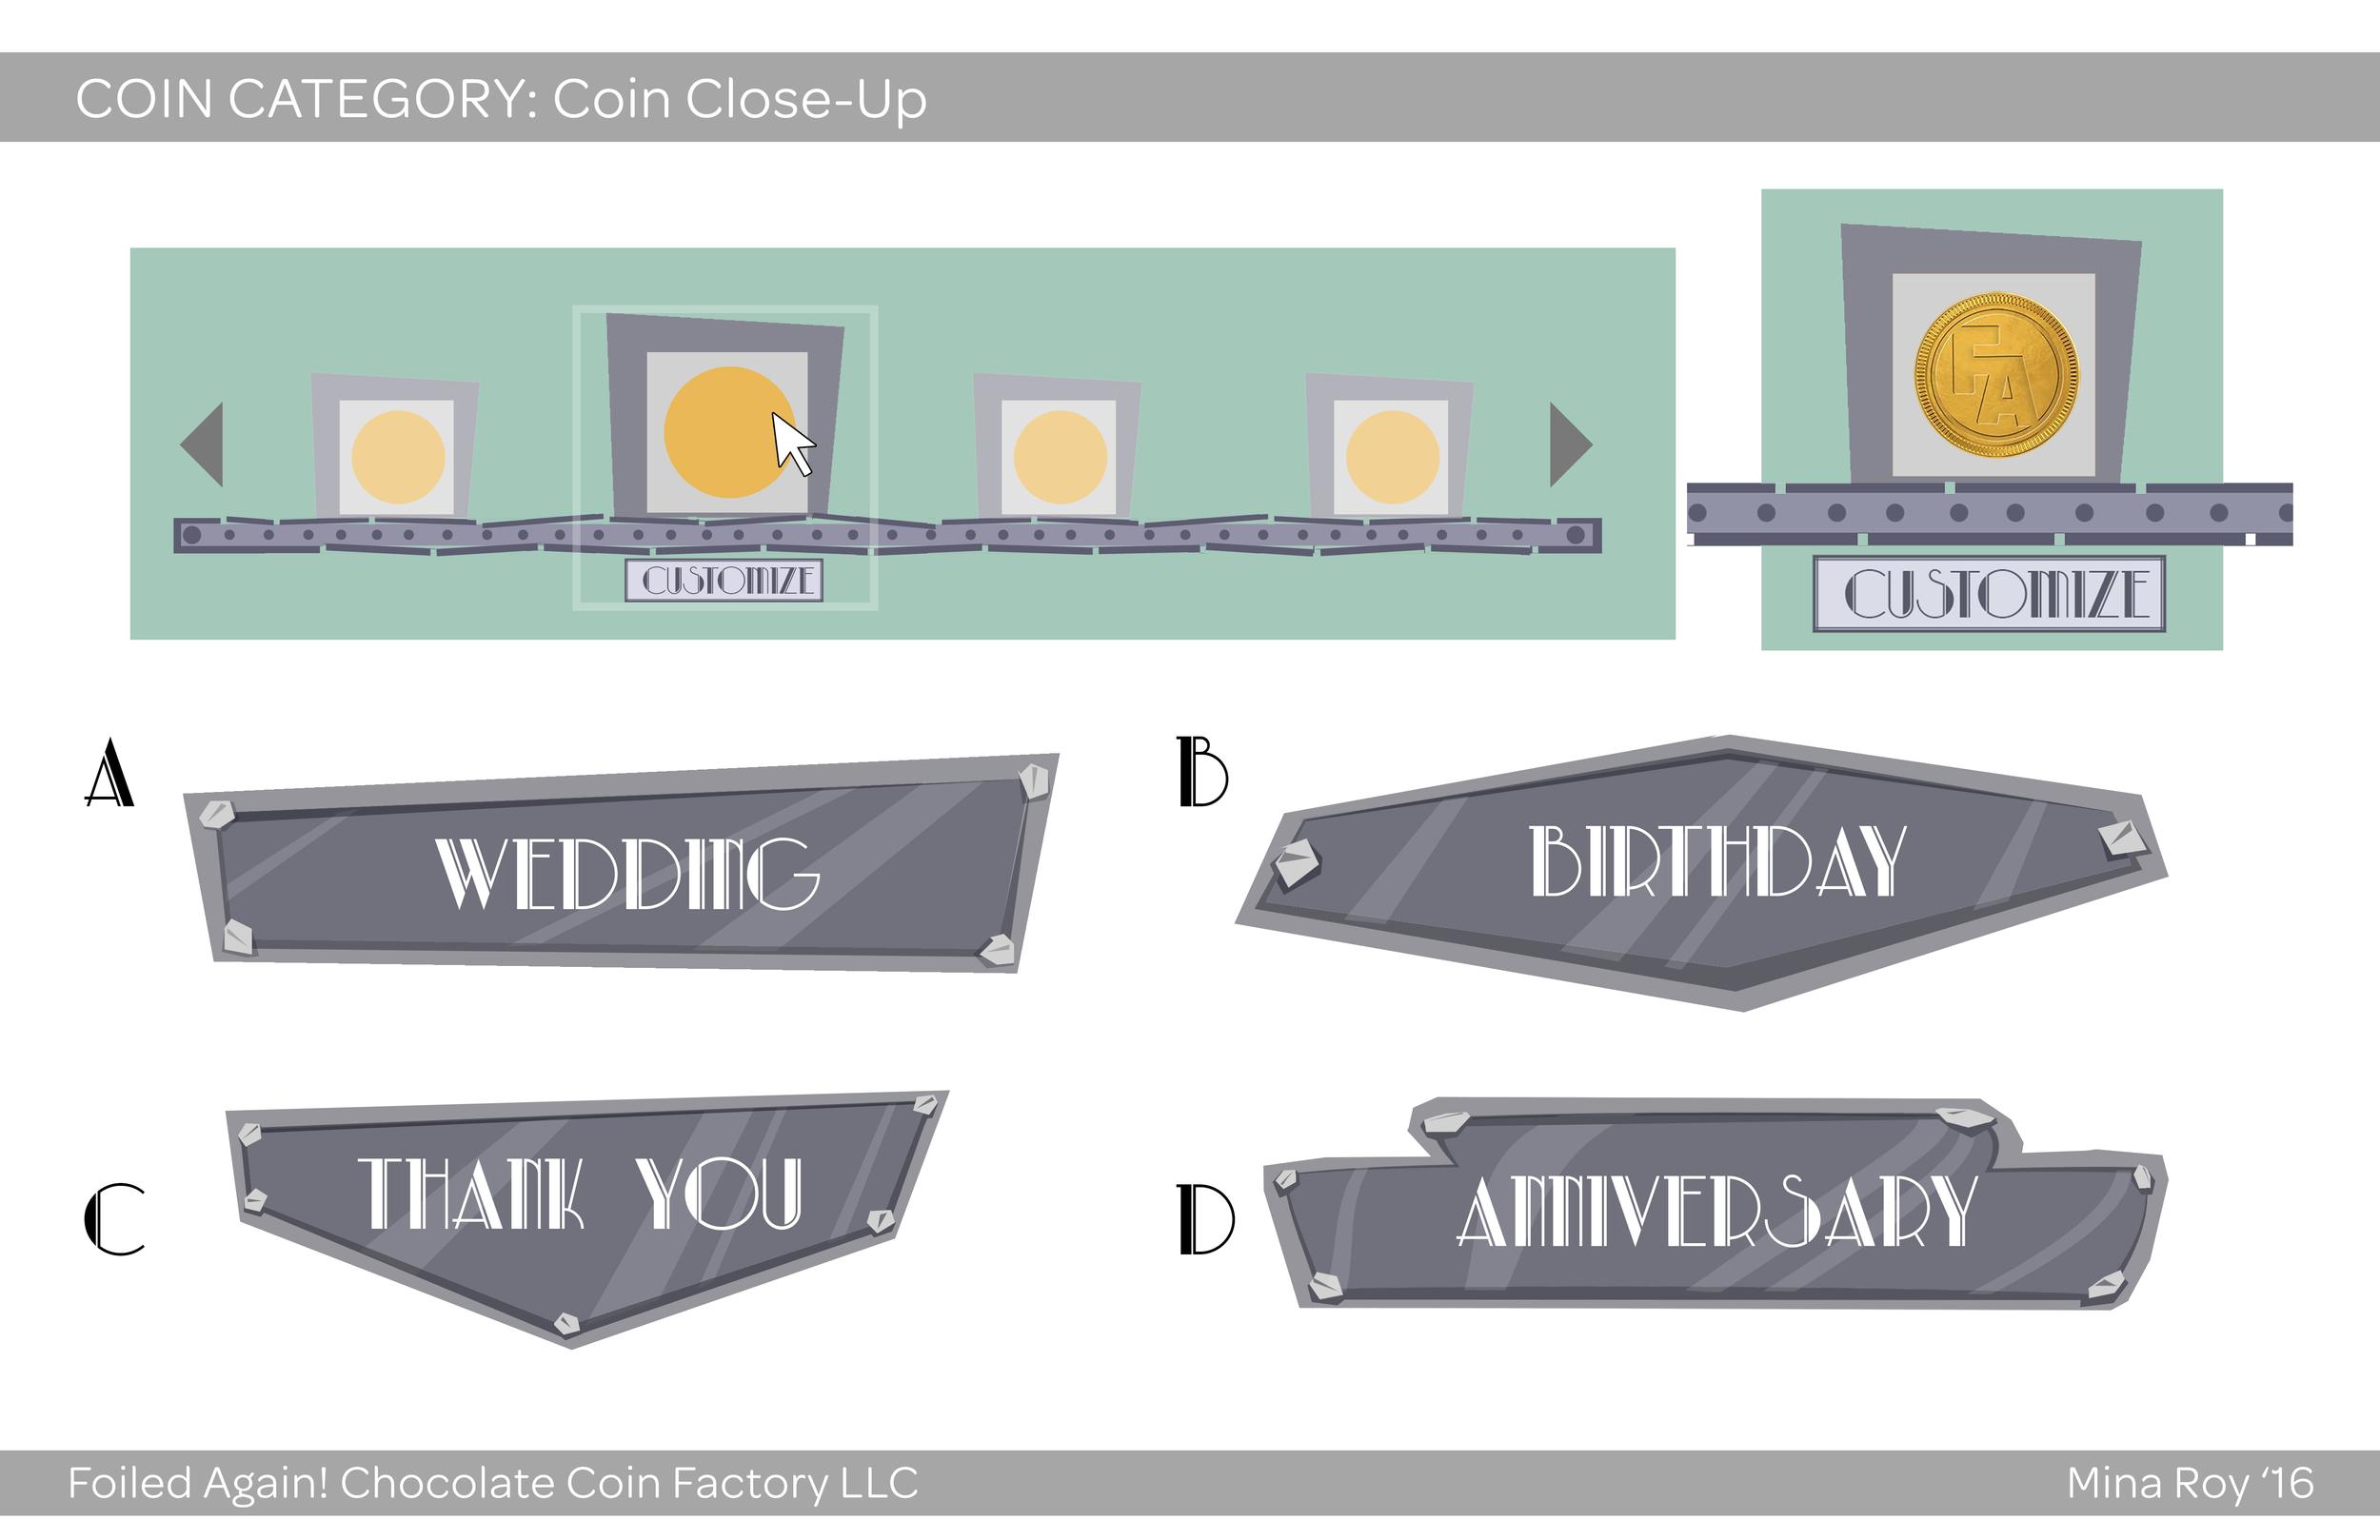 website-coincategory-conveyorbelT3.jpg